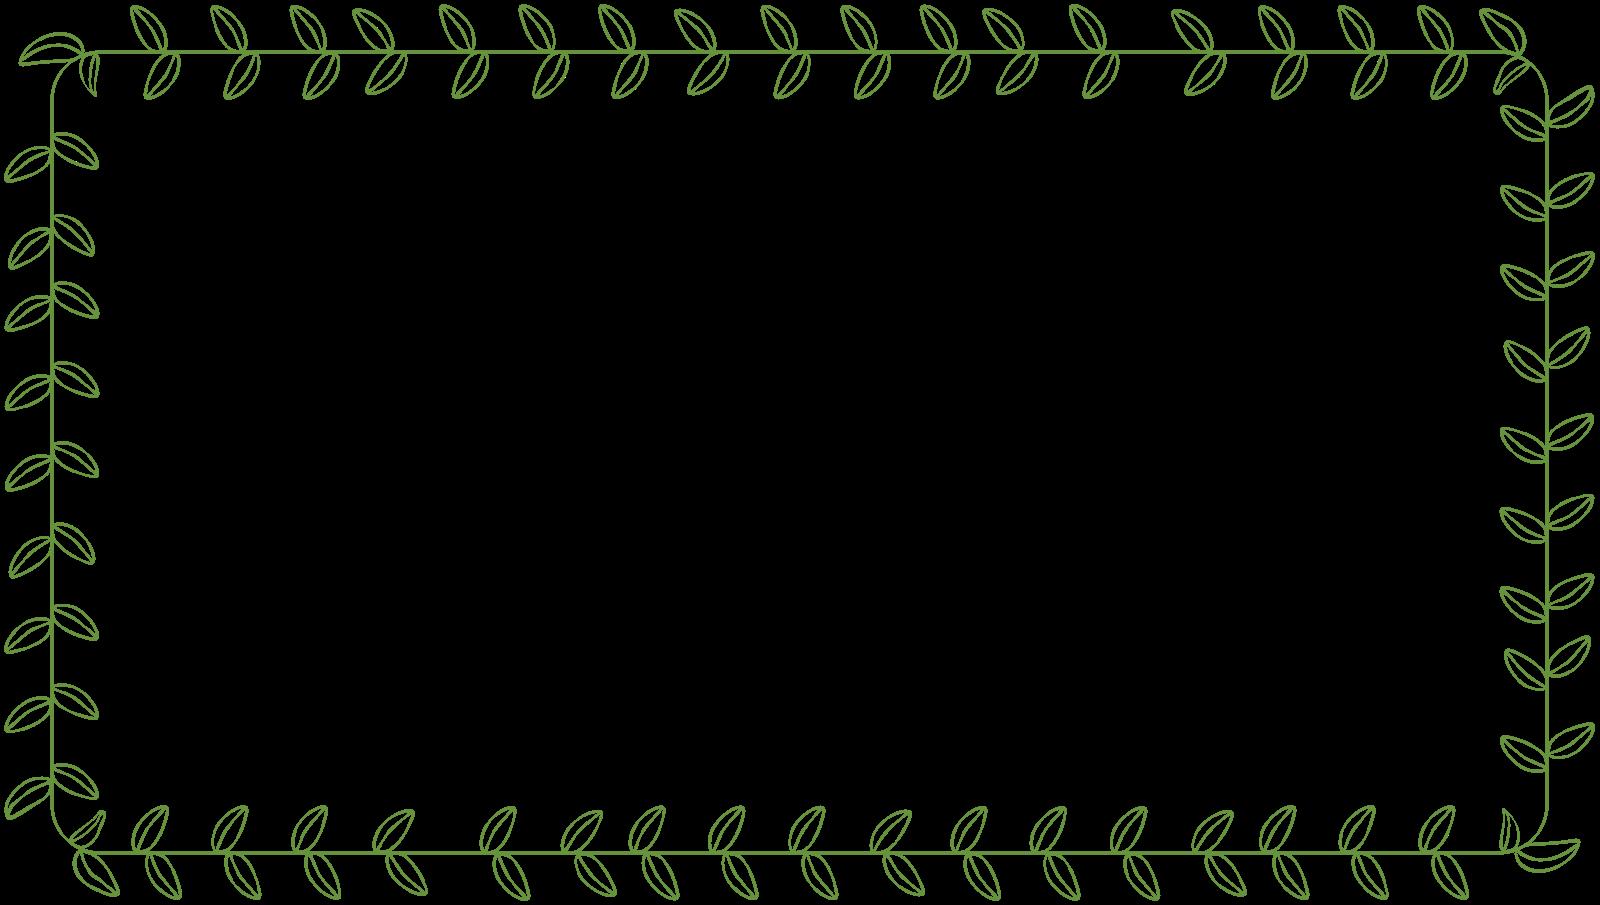 Cute arrow clipart free image royalty free Free Vine Border | Cricut | Pinterest | Clip art, Arrow and Clip art ... image royalty free